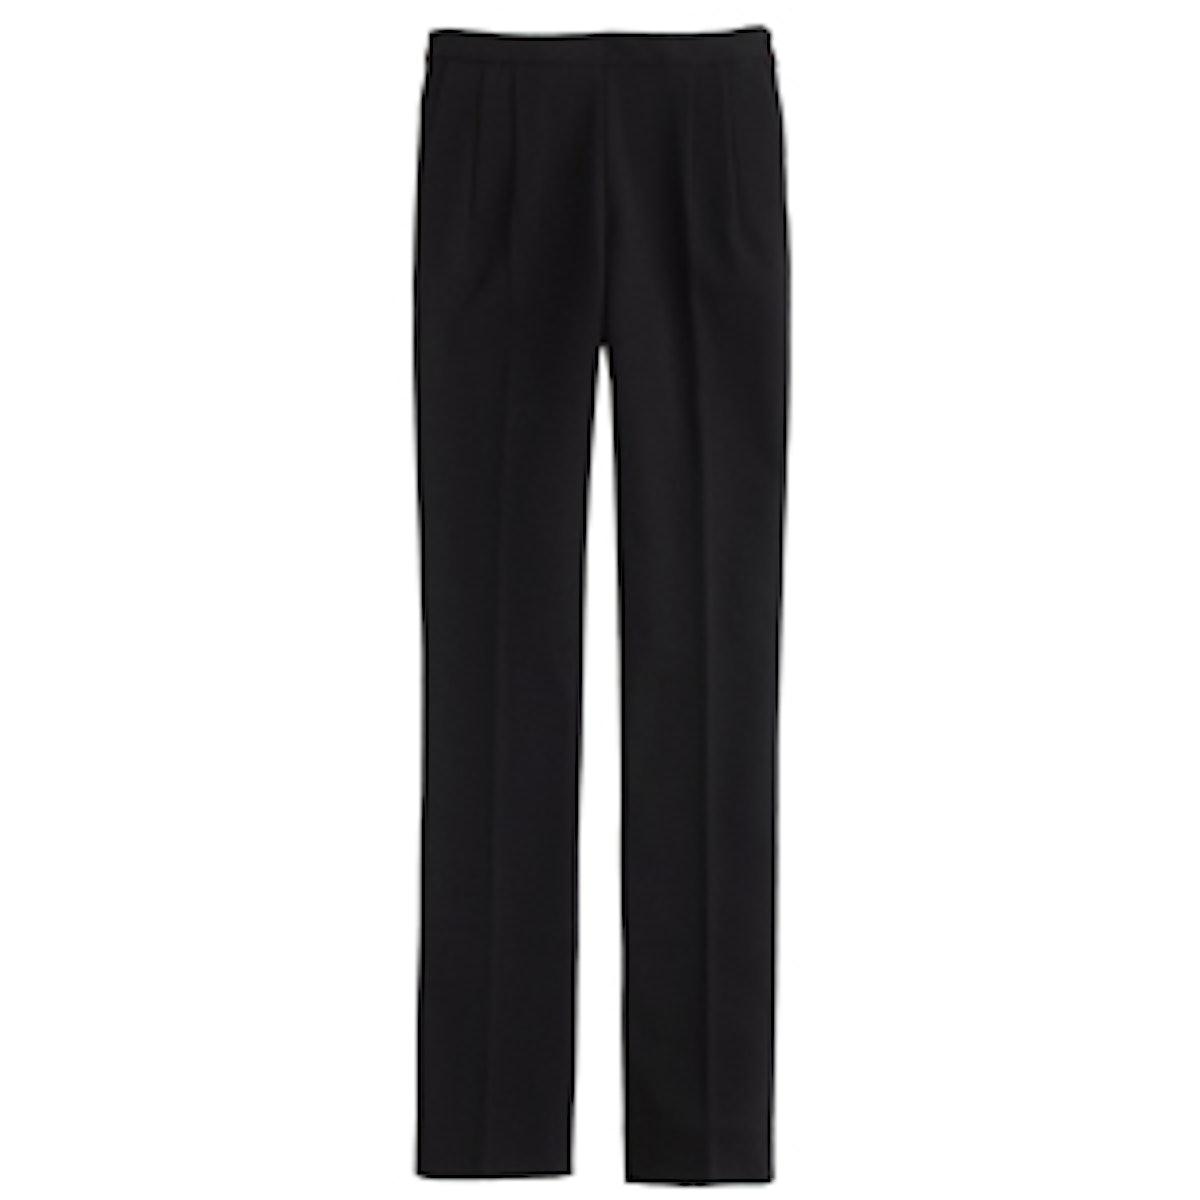 Back-Zip Pant in Bonded Crepe